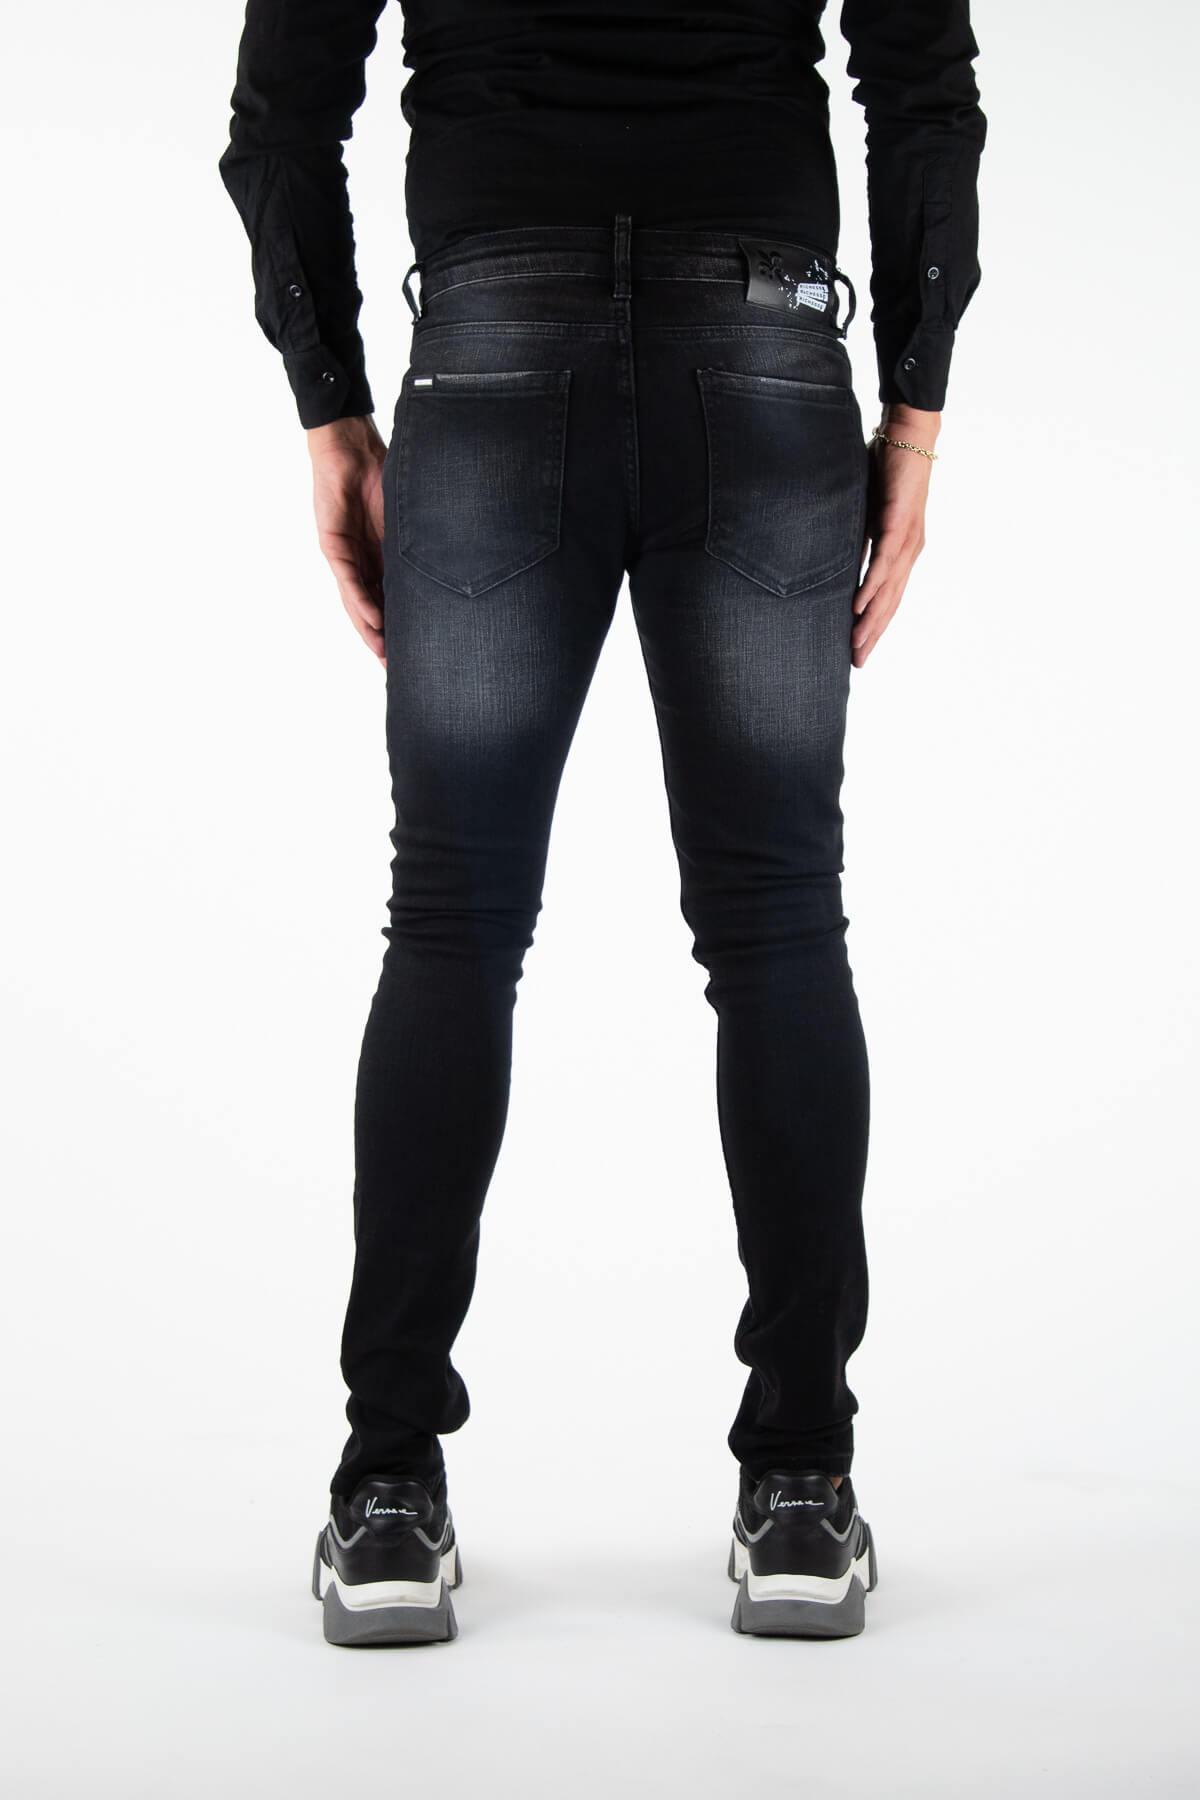 Novara Black Jeans-4